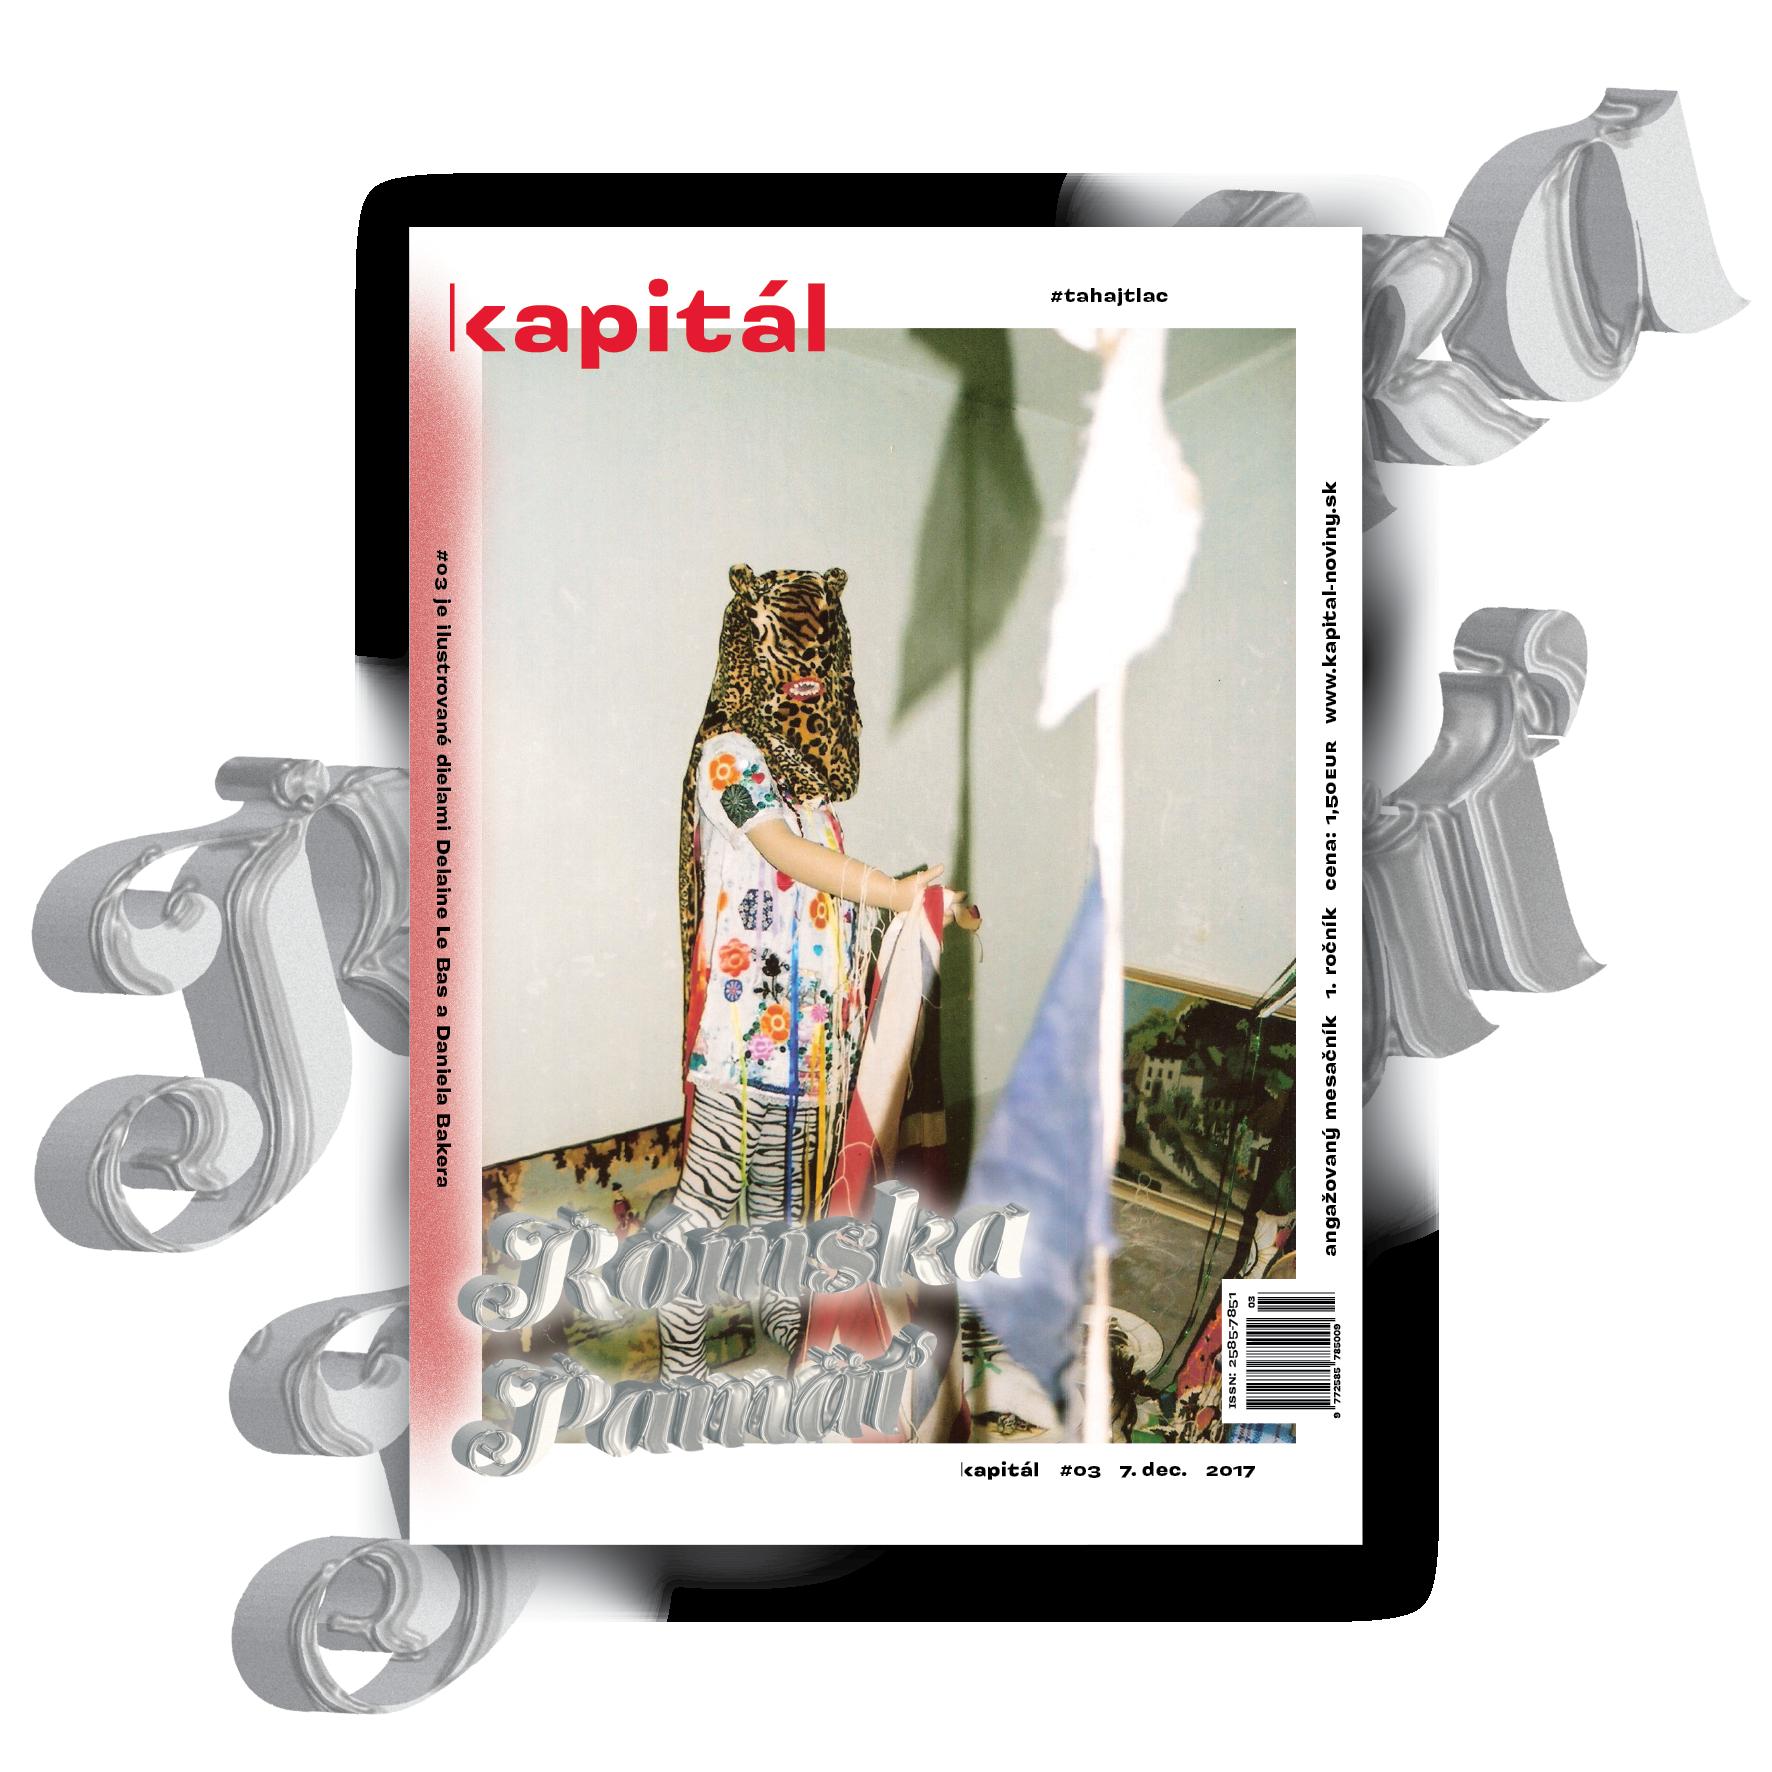 https://kapital-noviny.sk/wp-content/uploads/2018/09/1710_KAPITAL-02_Romska-pamat-na-web-profilovka.png